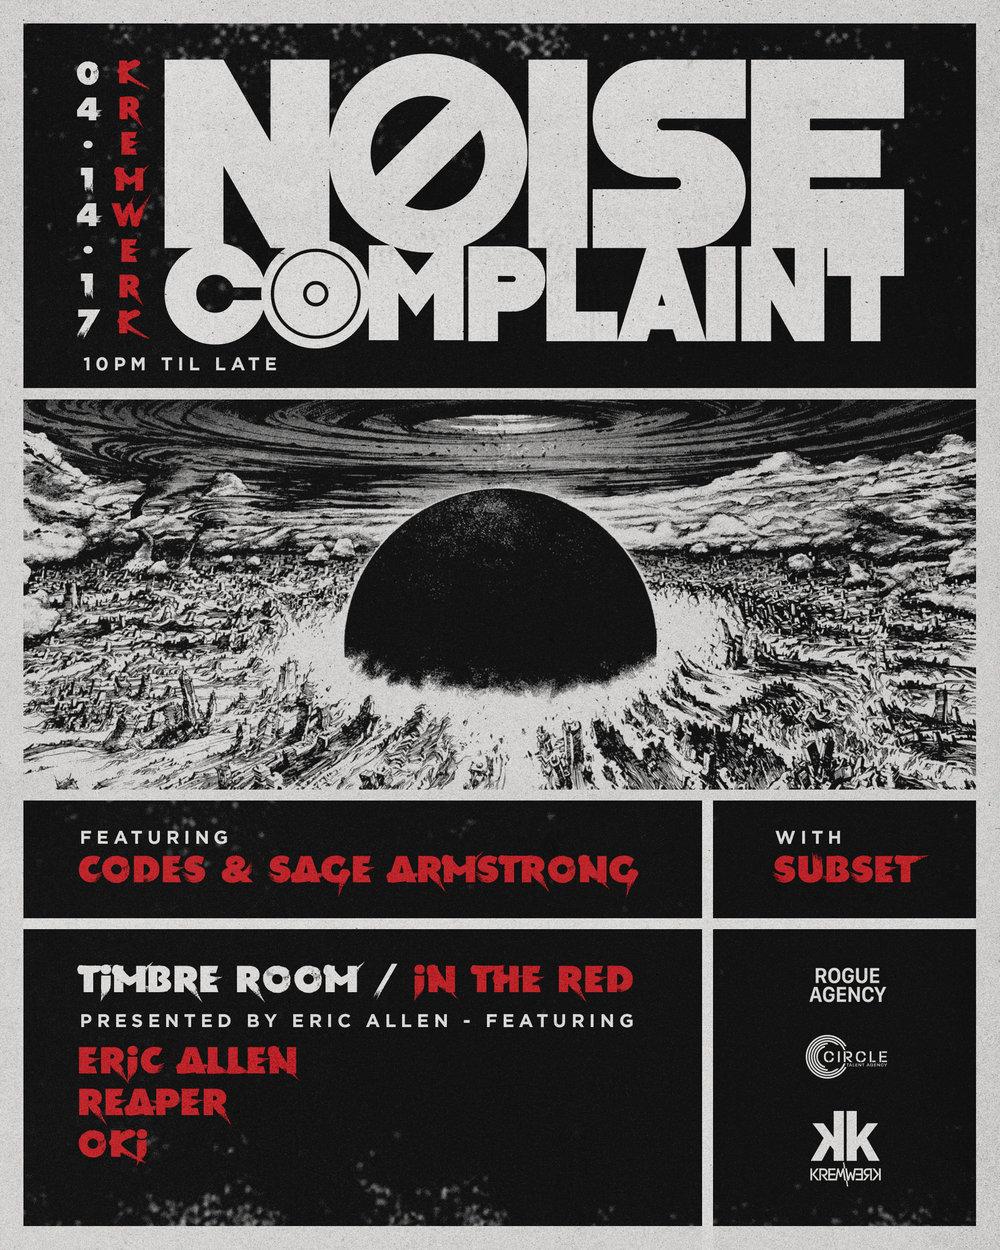 IG & FB_4X5_Noise Complaint 041417.jpg